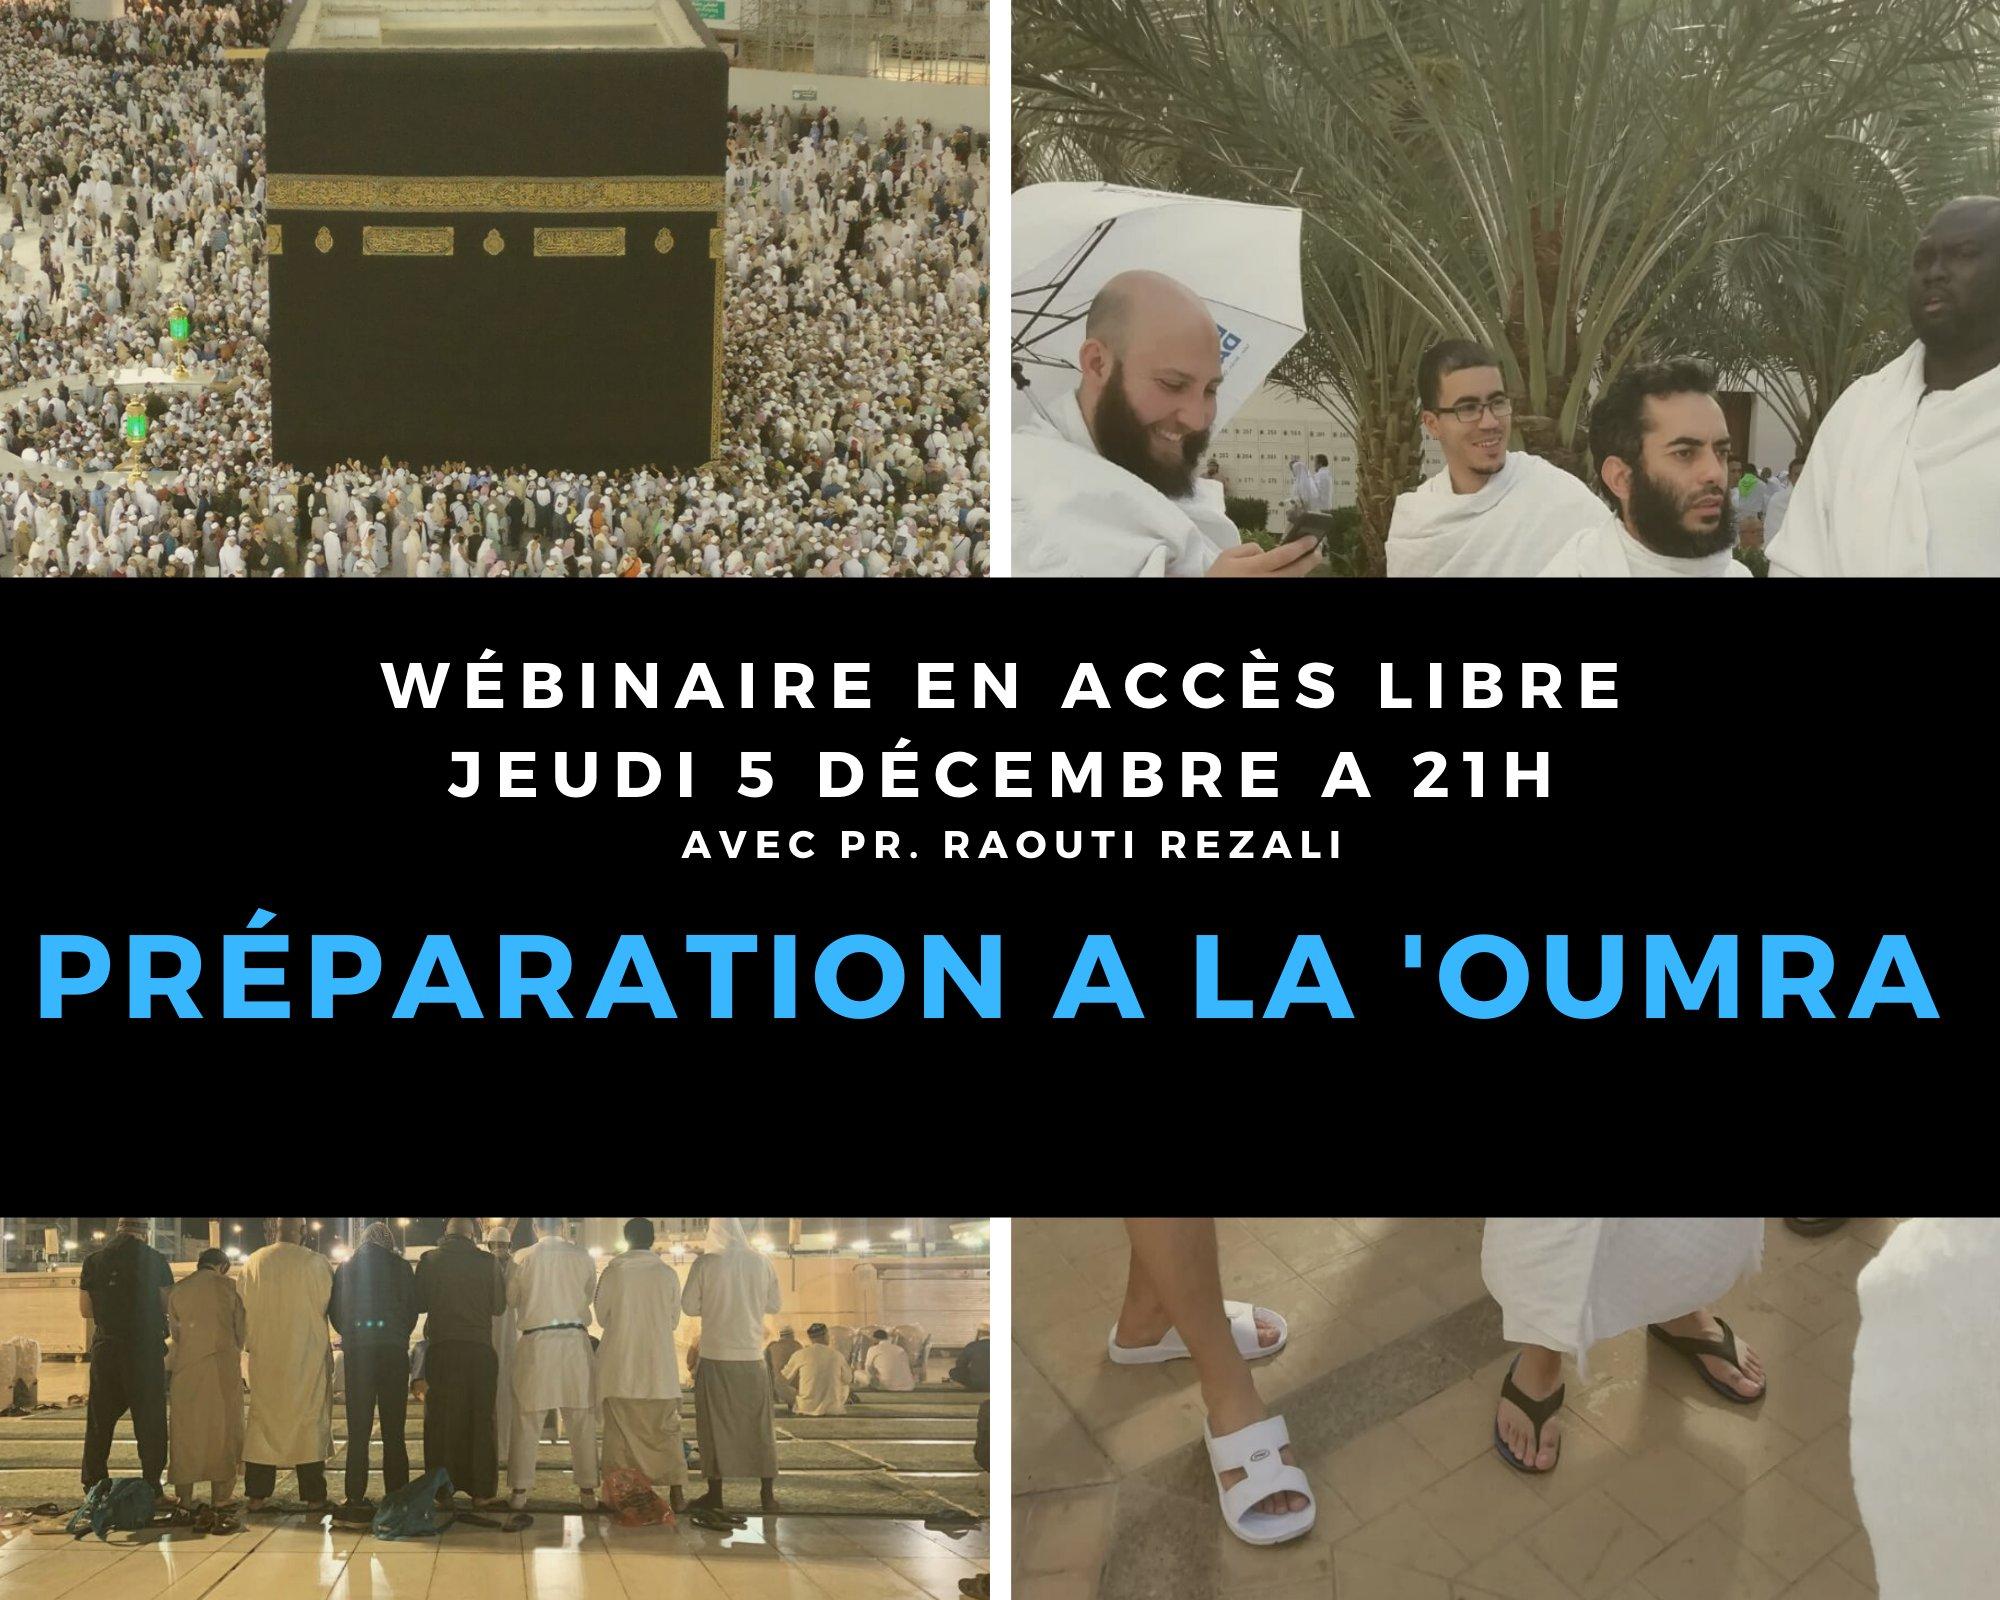 https://www.saphirnews.com/agenda/Webinaire-en-acces-libre-Preparation-a-la-Oumra_ae685184.html